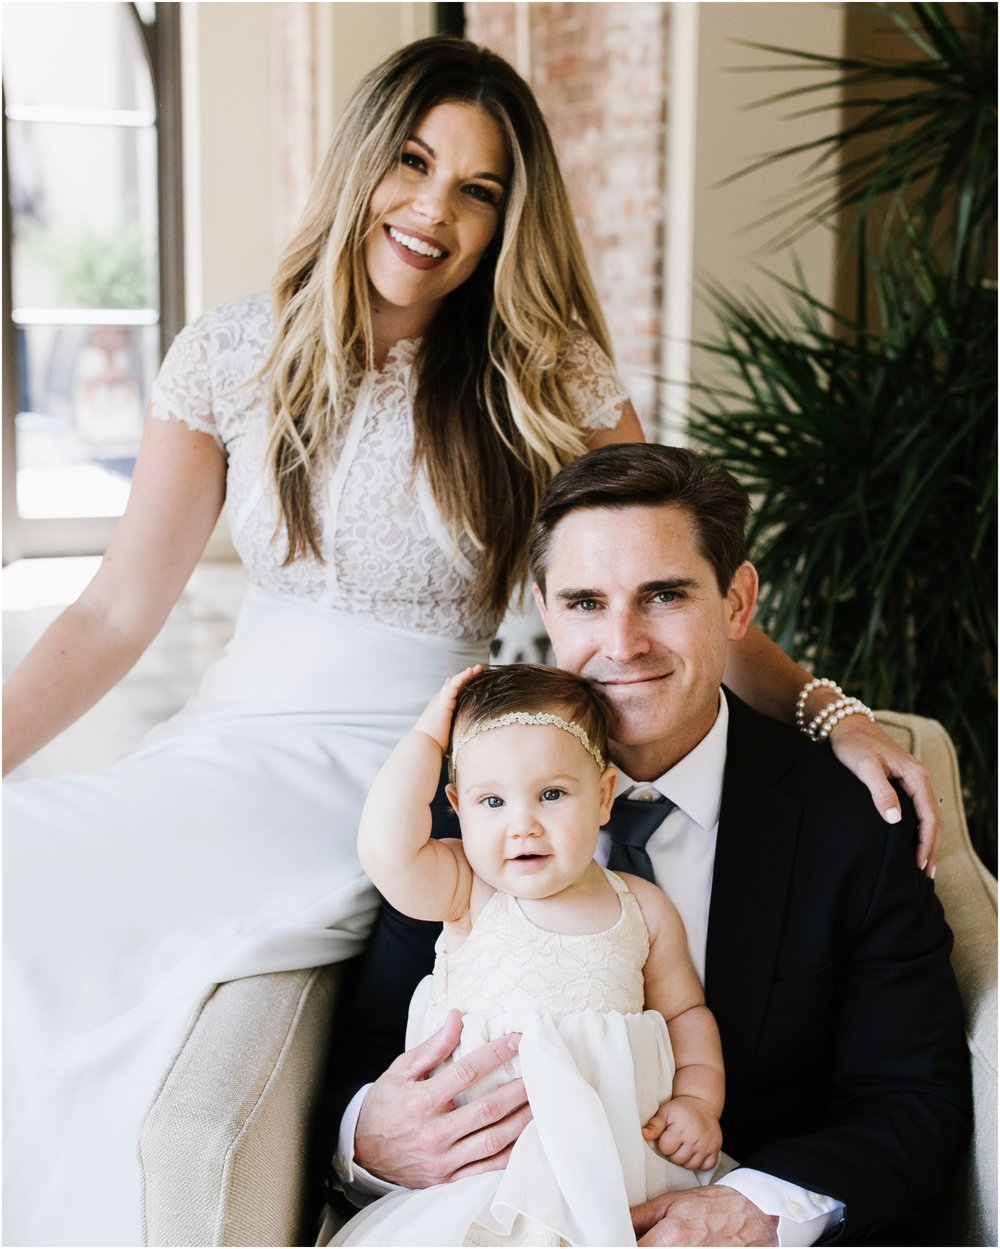 Mire-Blessing-Baptism-Family-2018-June-8780_quaint-and-whim-lifestyle-photographer-louisiana-.jpg